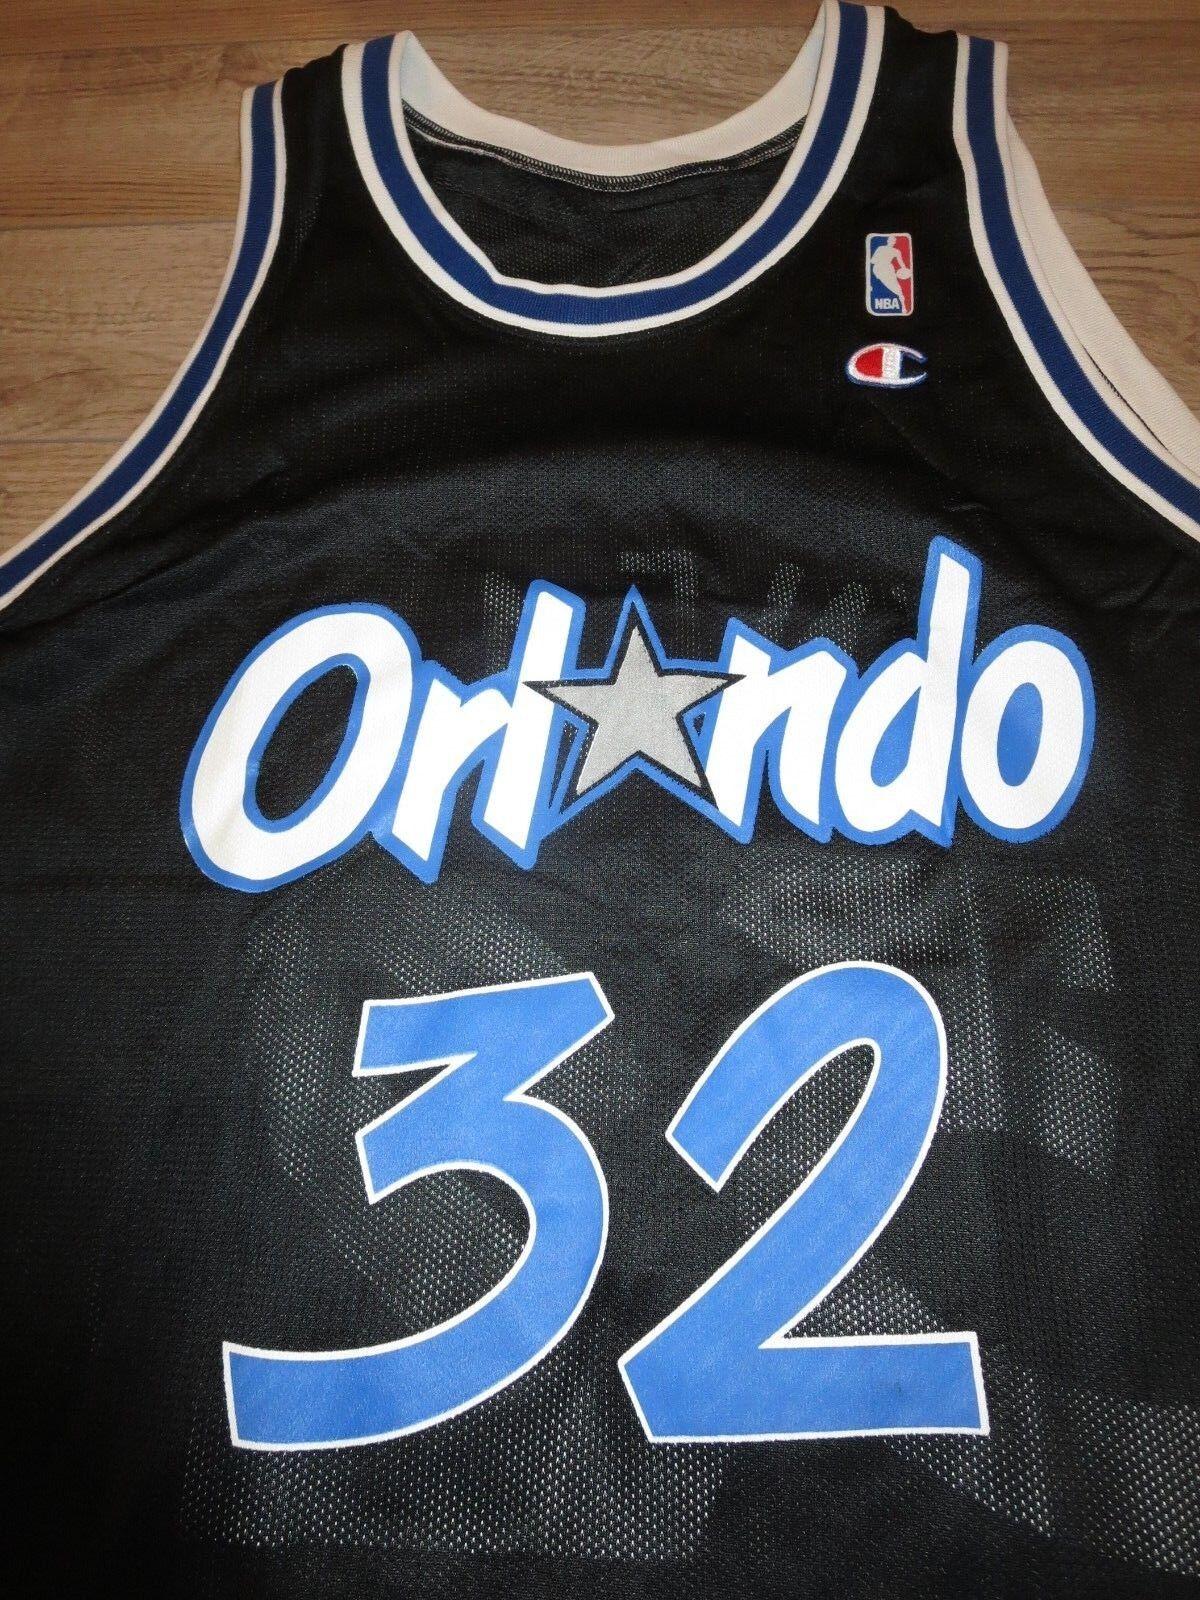 Shaquille Shaquille Shaquille O'Neal  32 Orlando Magic Schwarz Champion NBA Trikot 48 0dde67